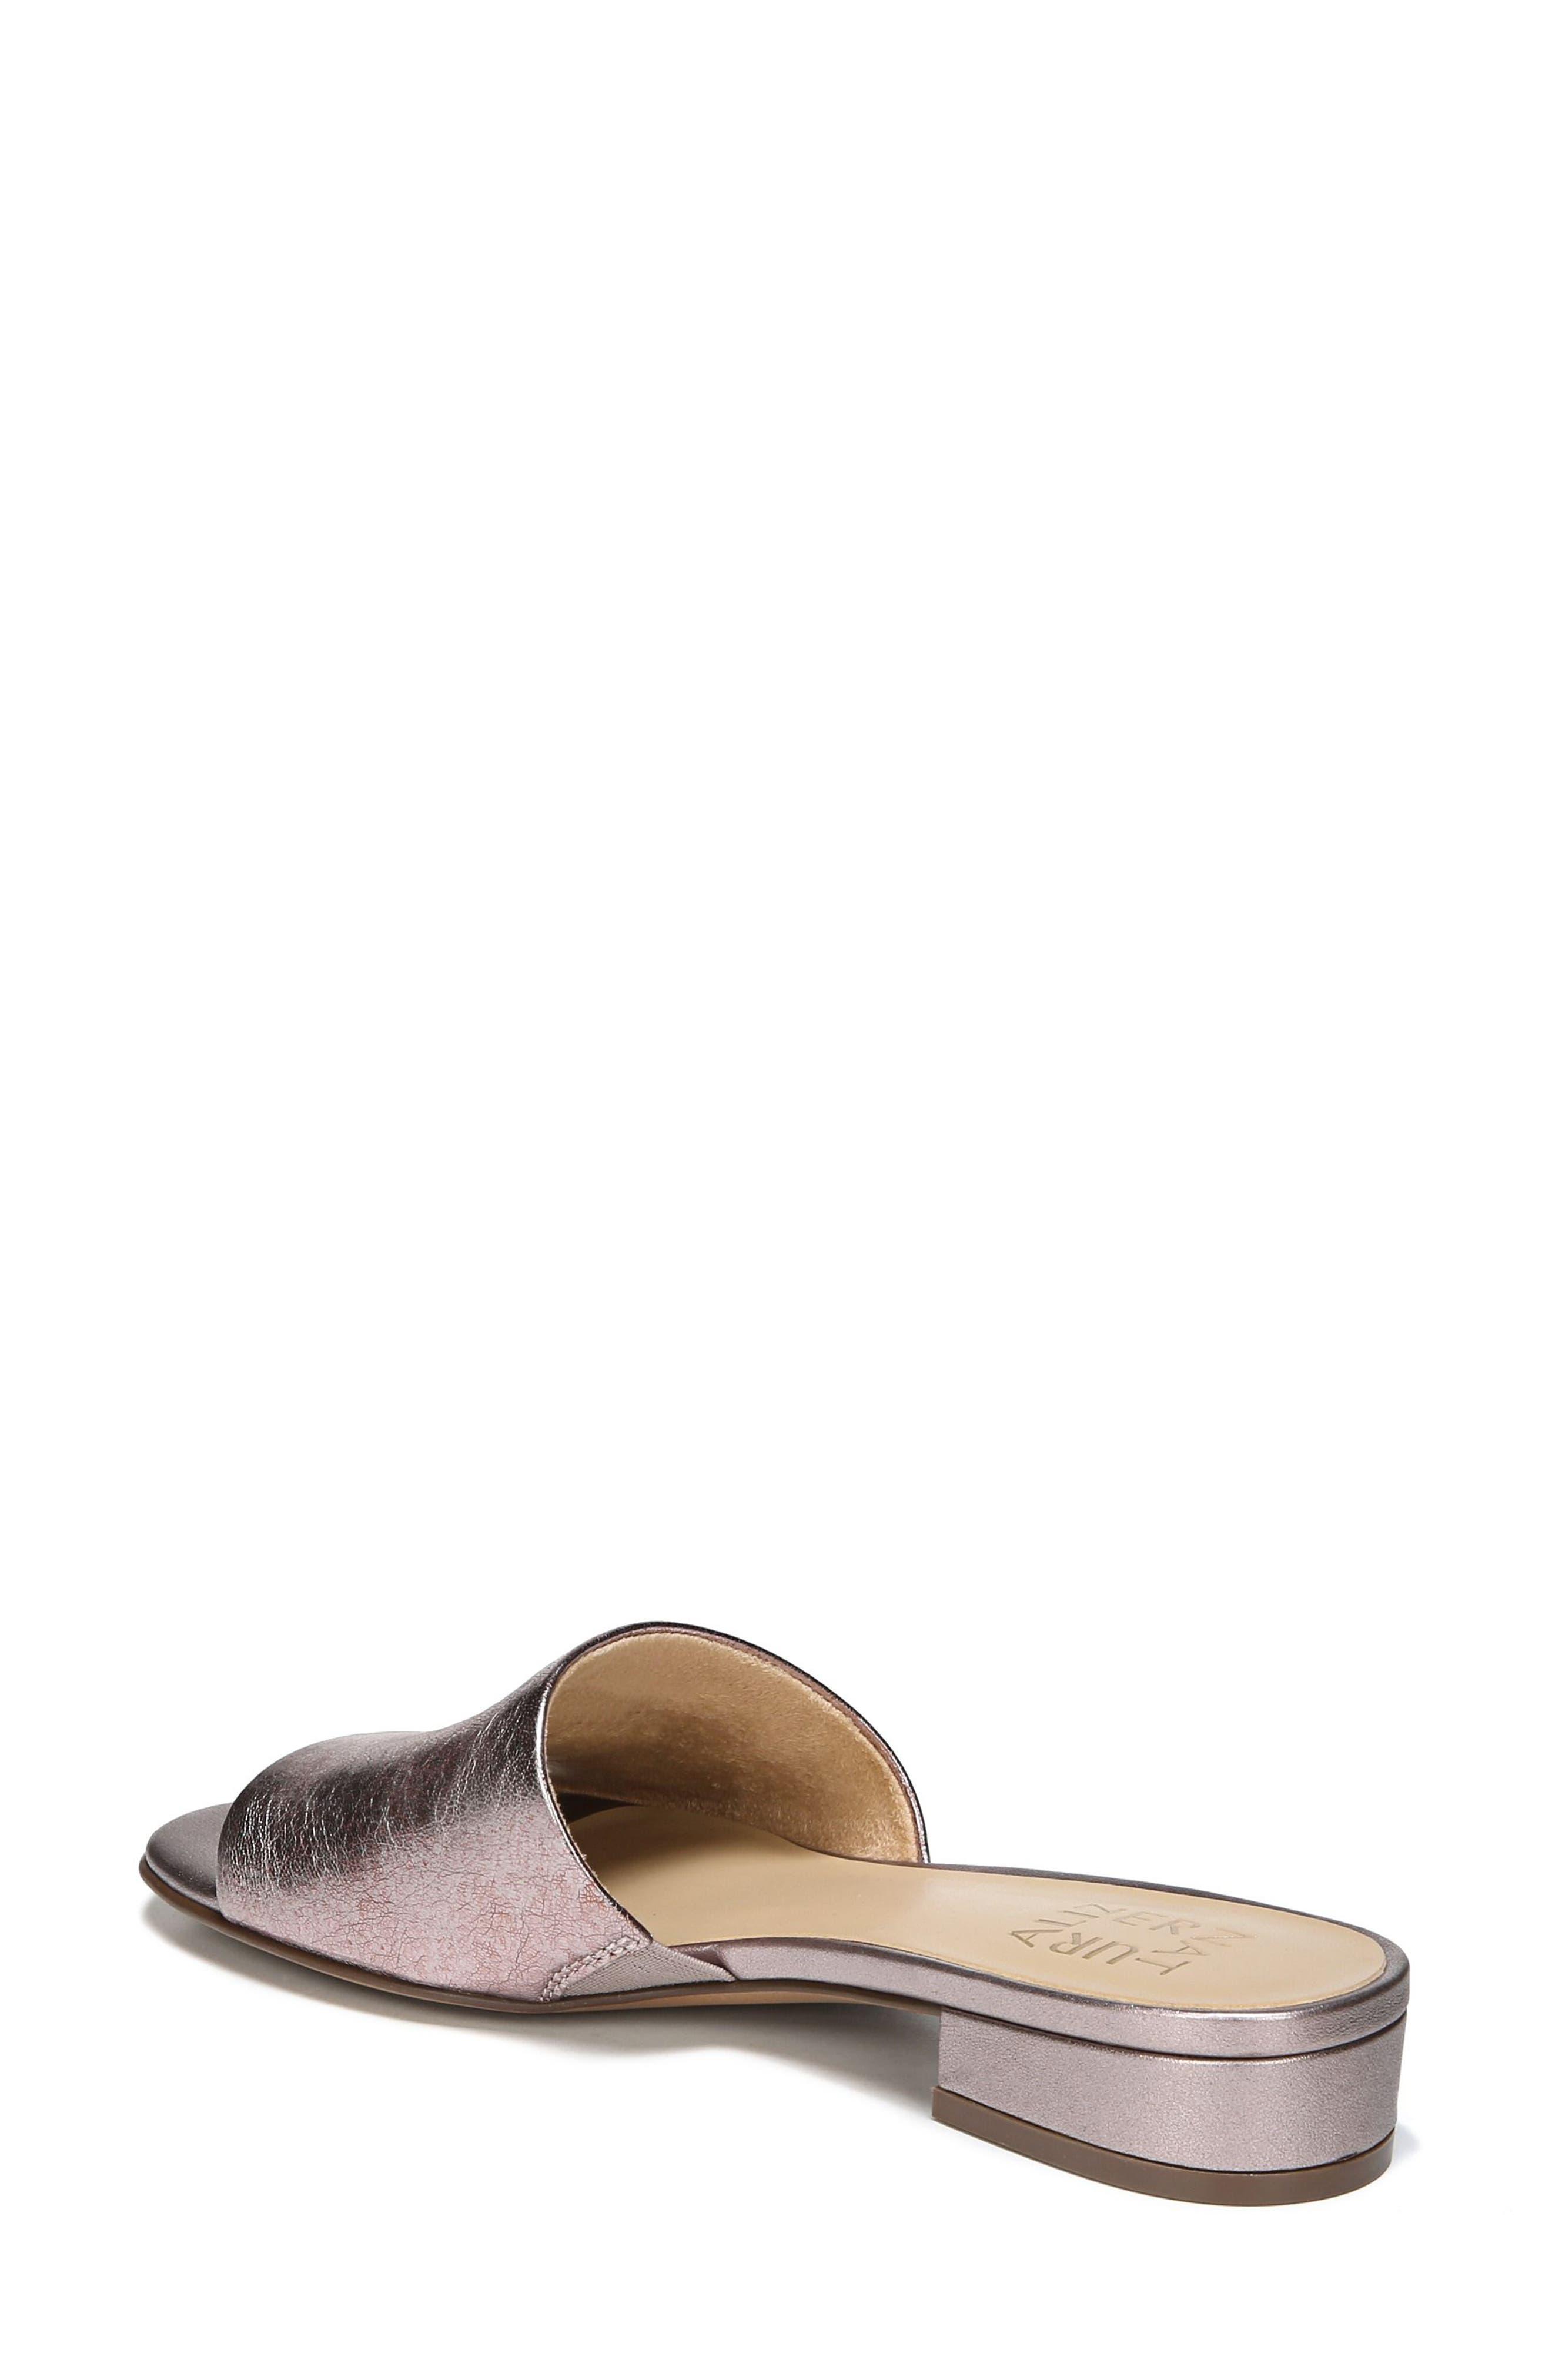 Mason Slide Sandal,                             Alternate thumbnail 10, color,